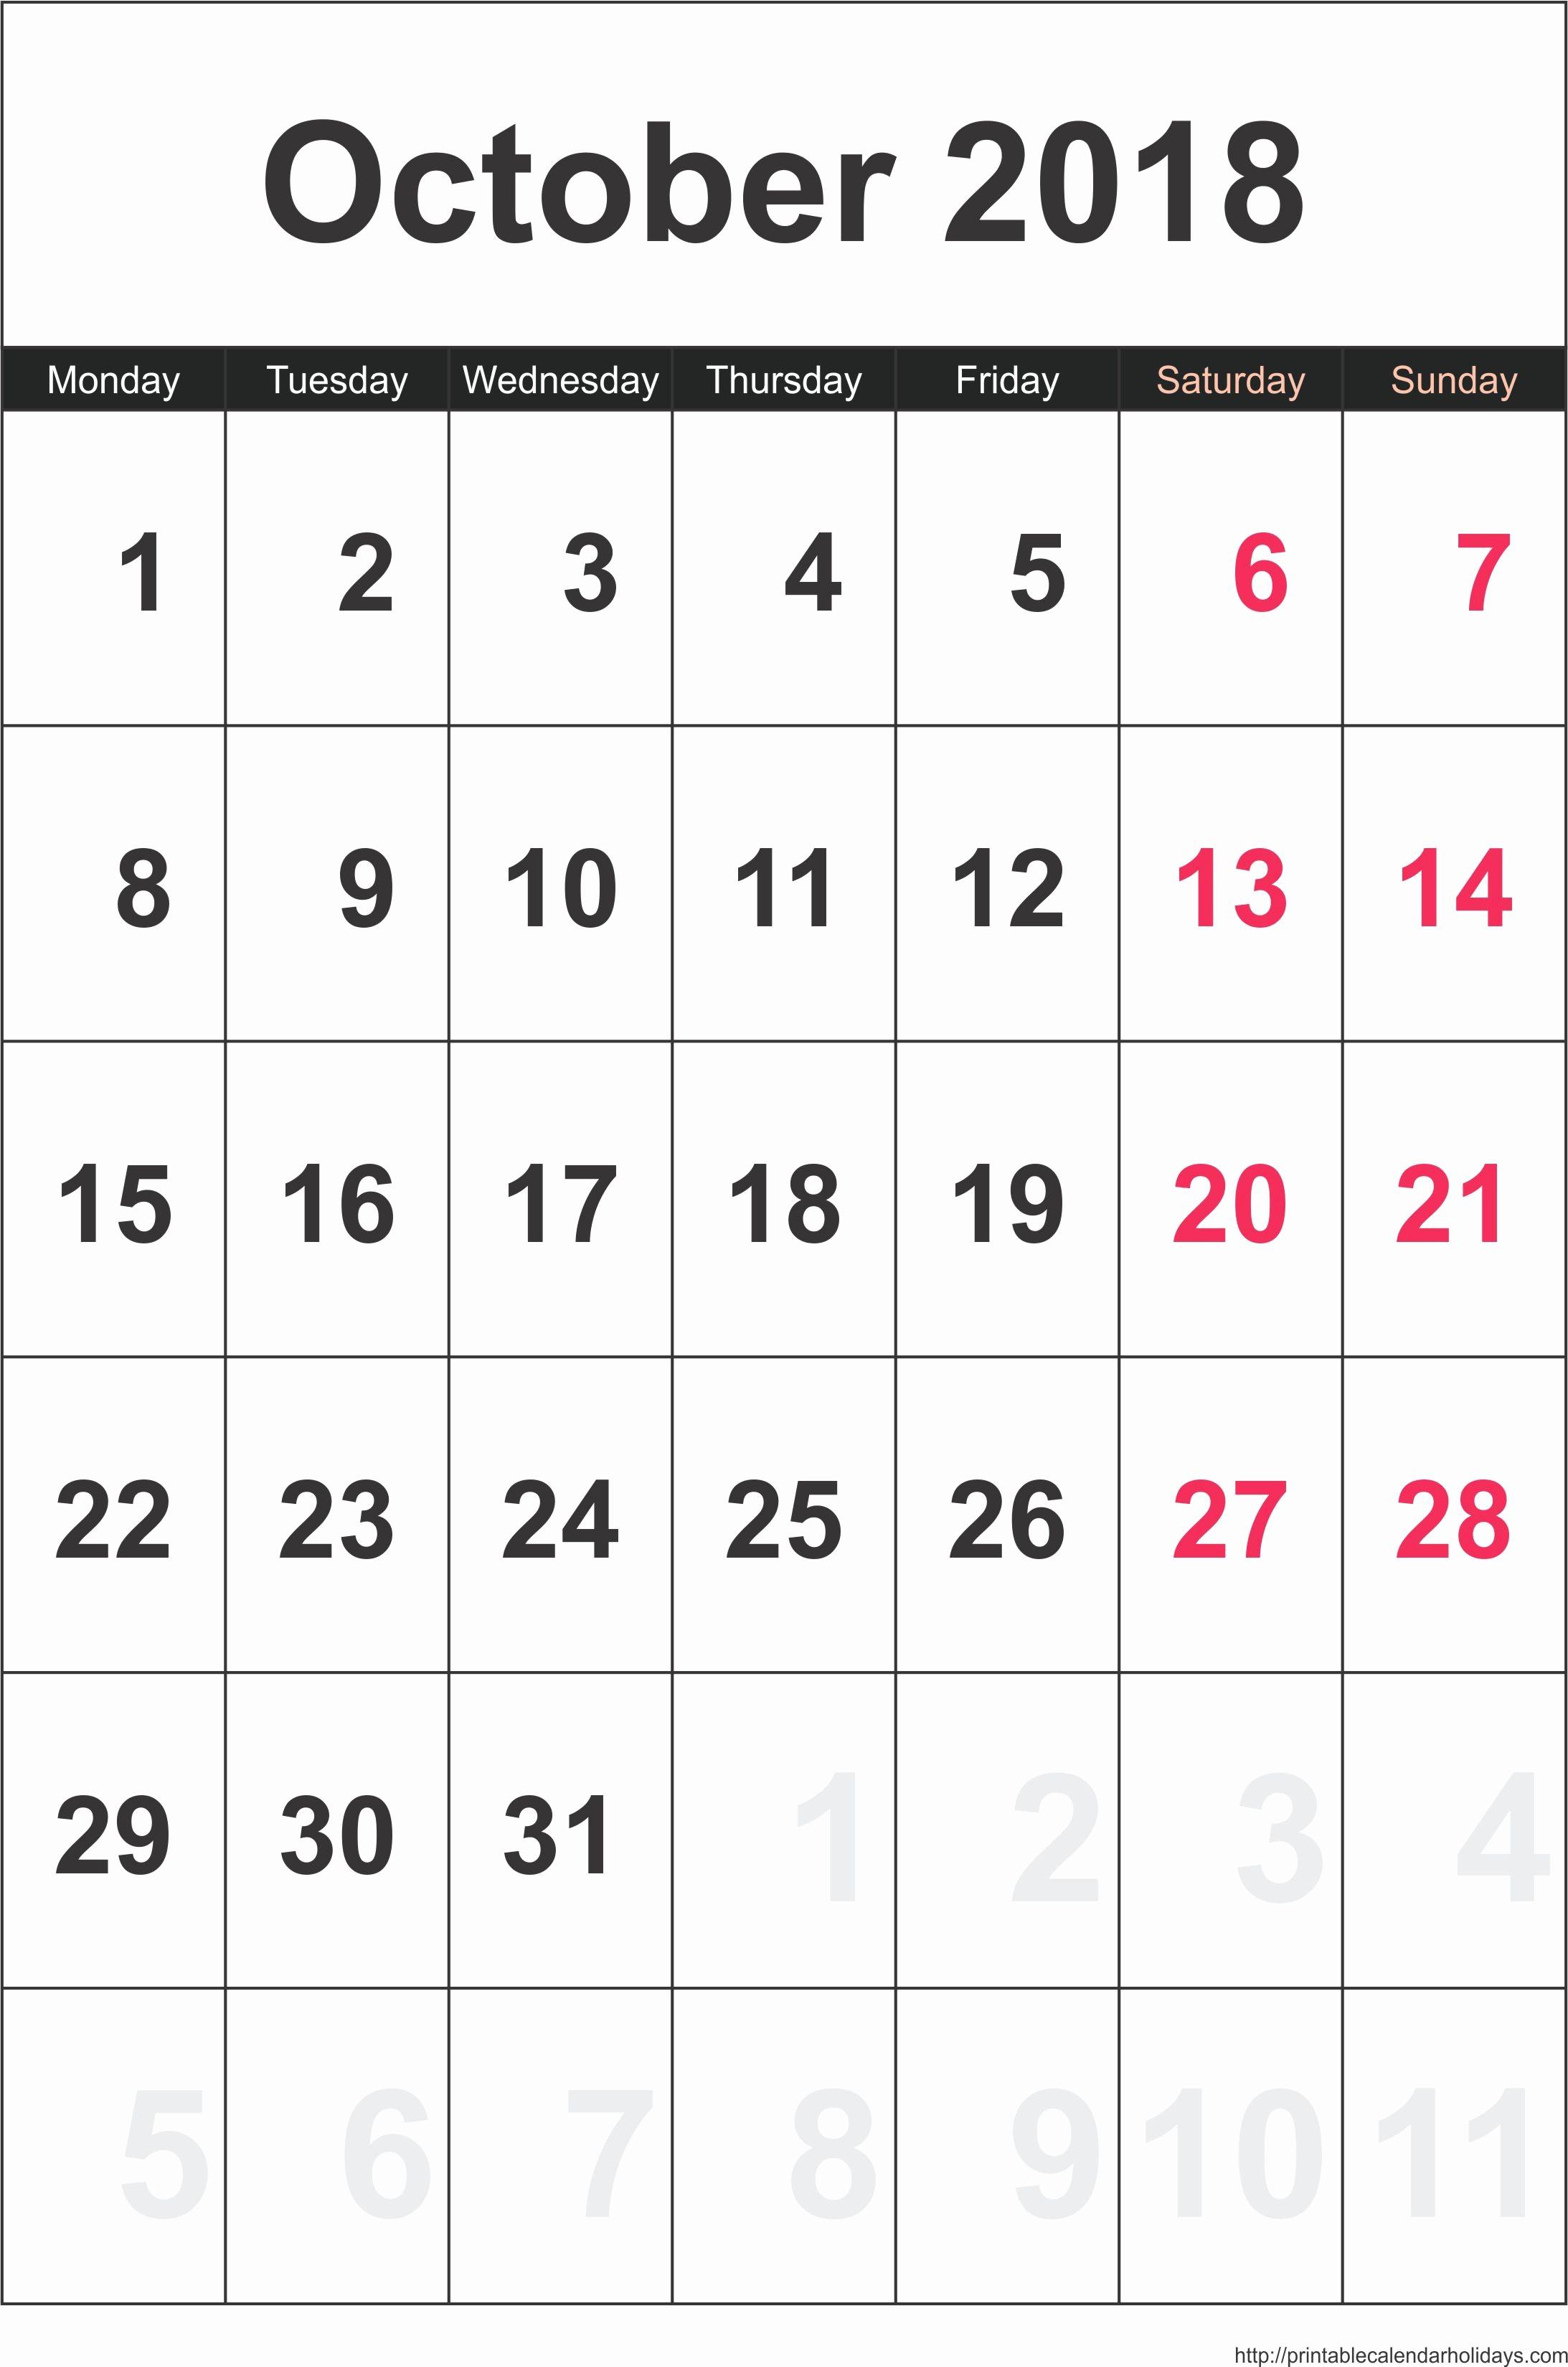 Calendar 2016 Printable with Holidays Luxury Monthly Calendars Archives Free Printable Calendar 2016